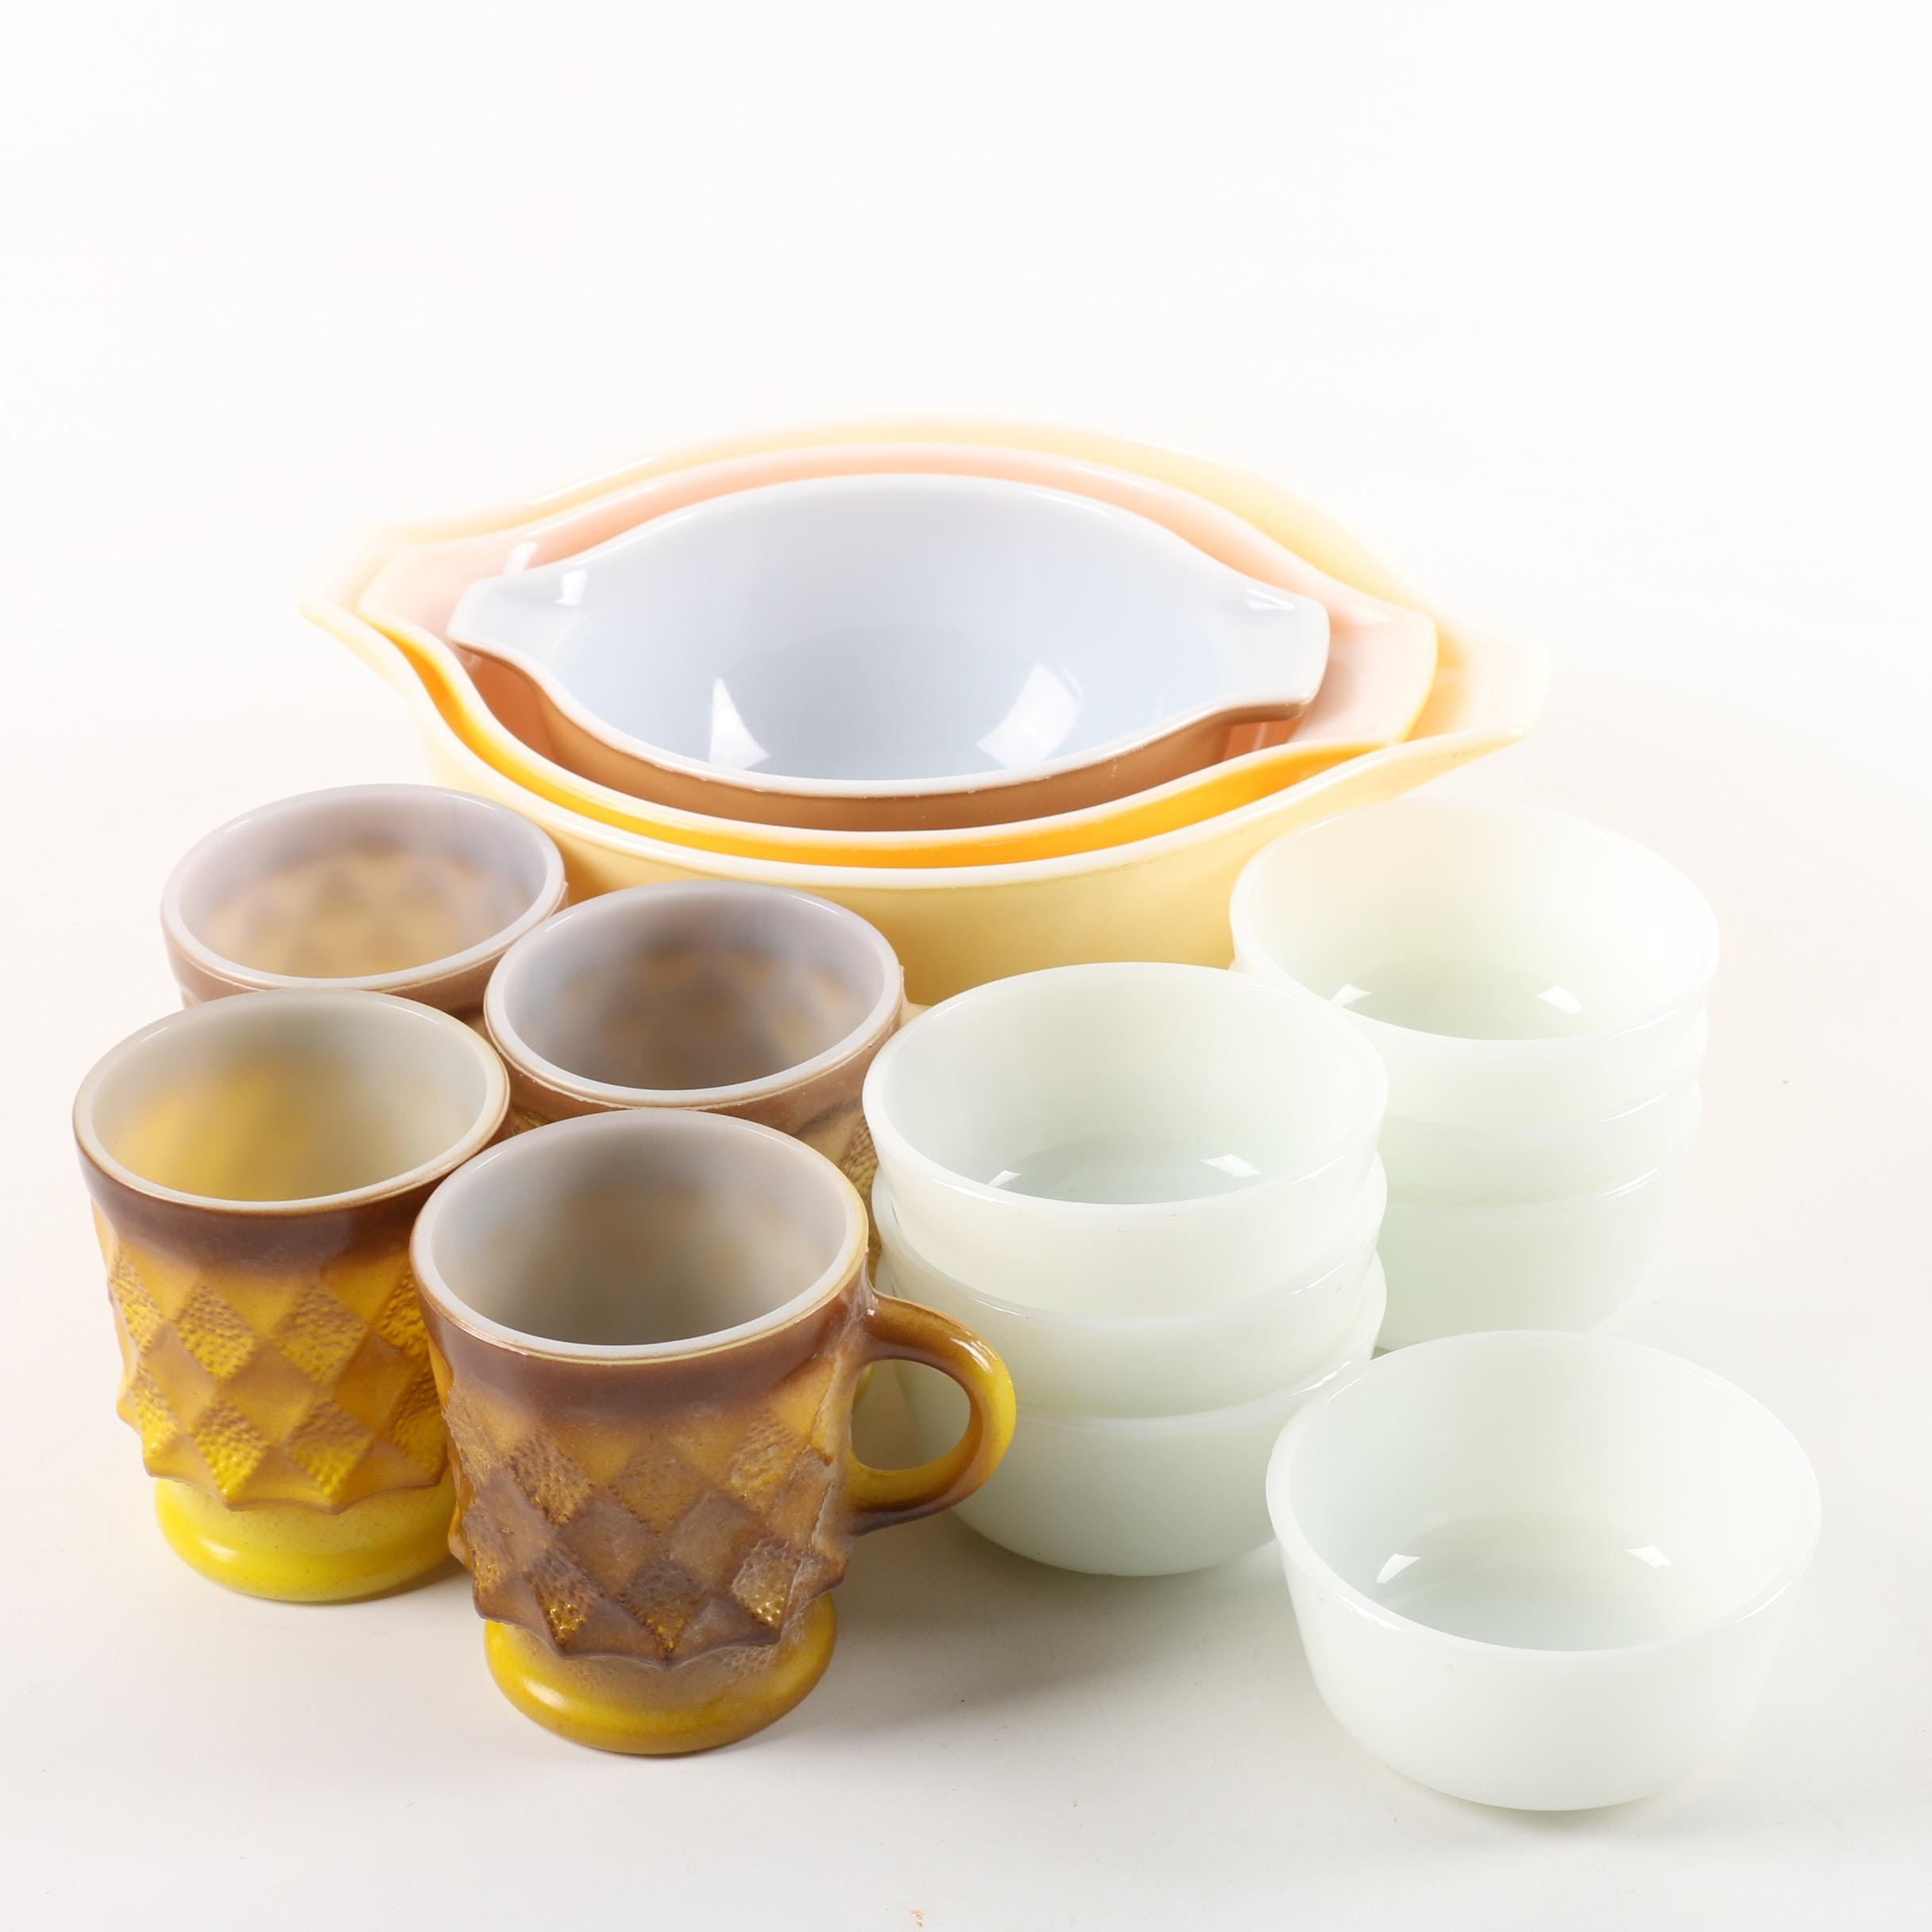 "Vintage Anchor Hocking ""Kimberly"" Glass Mugs with Ramekins and Pyrex Bowls"